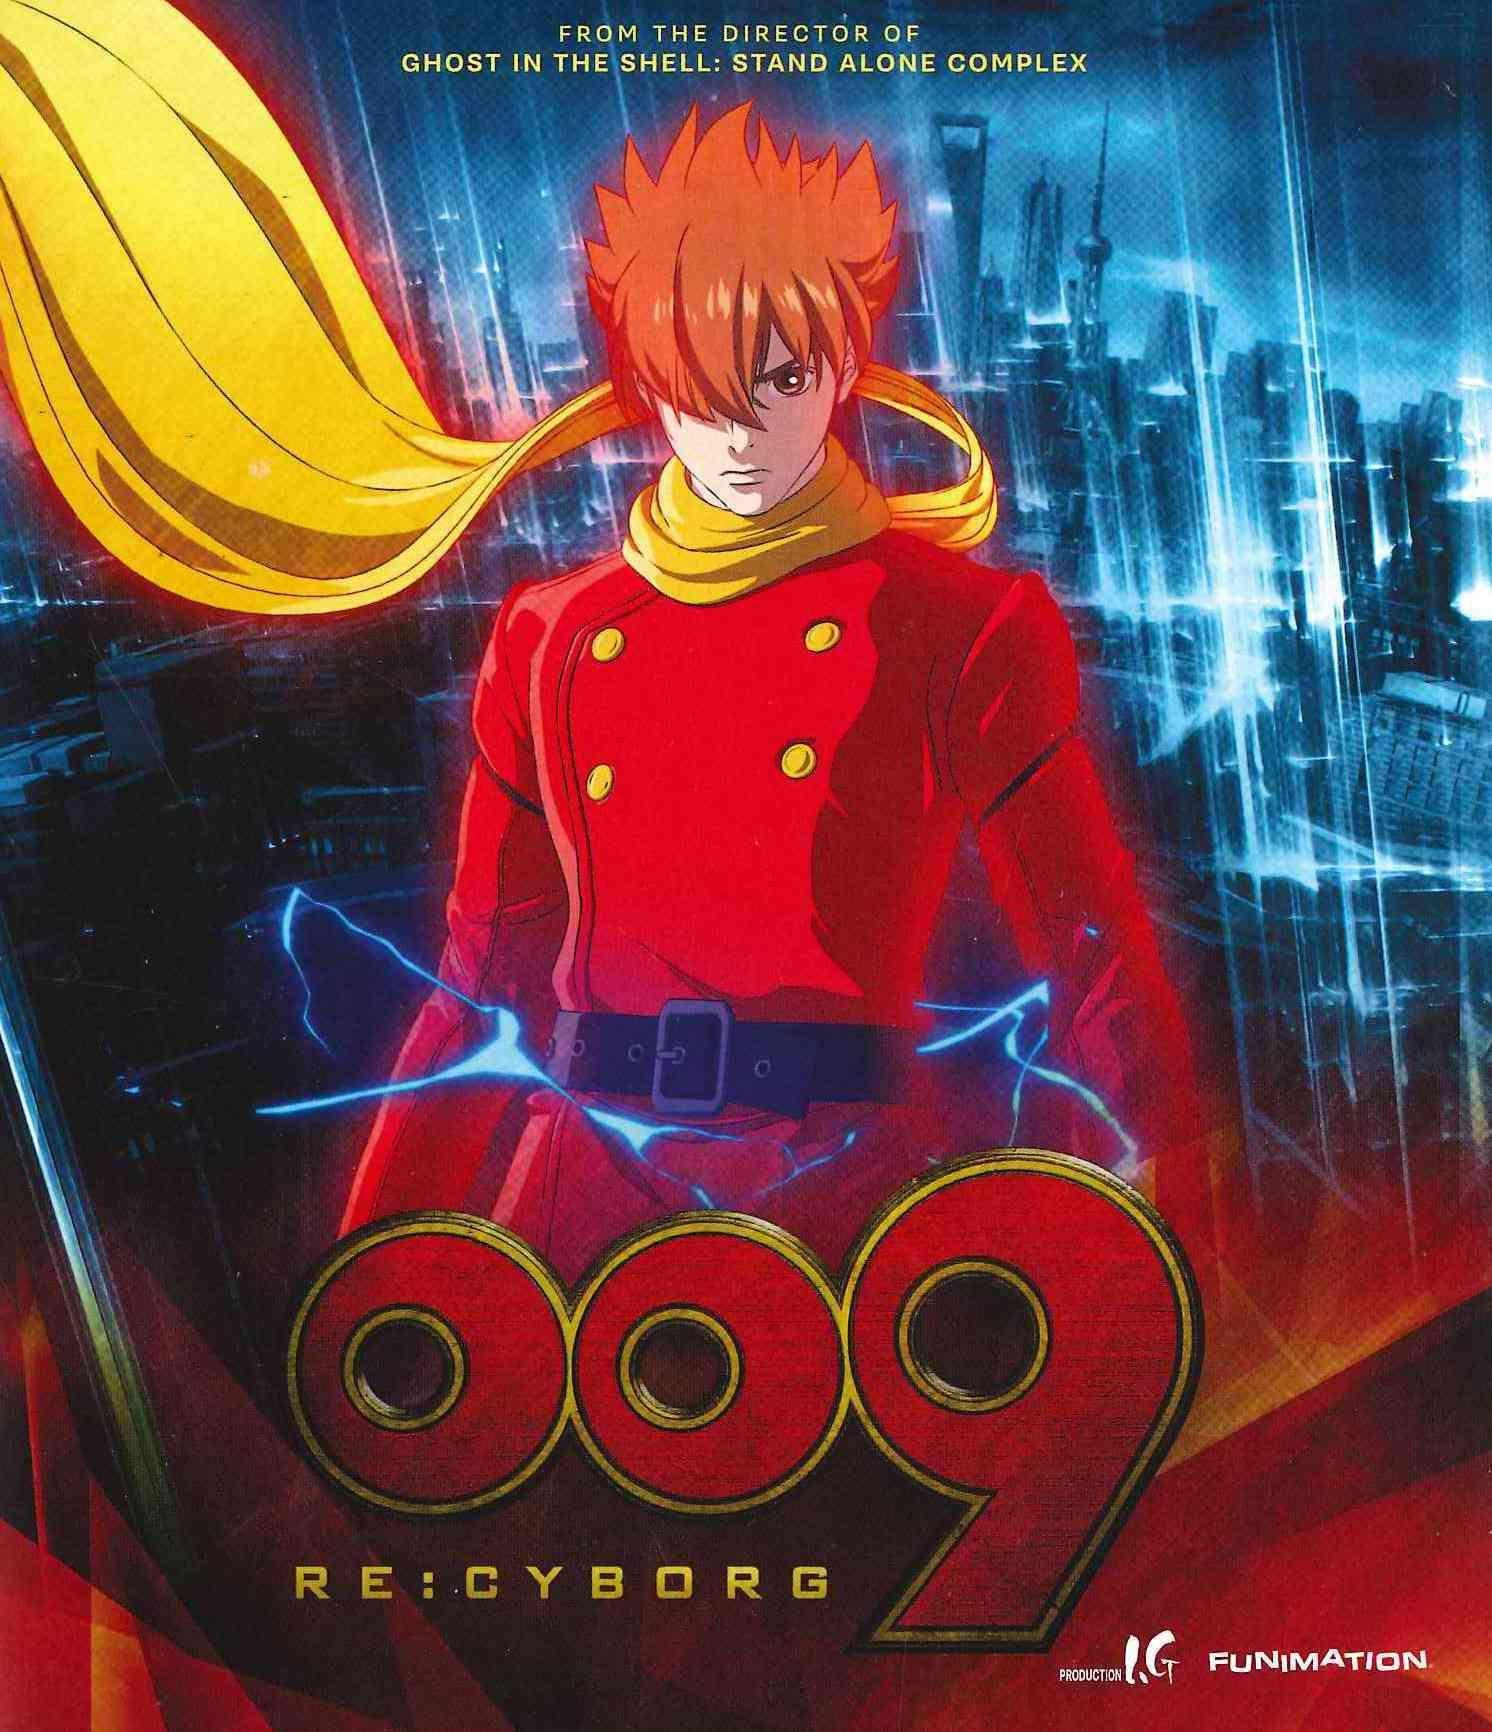 009 anime dubbed anime anime reviews